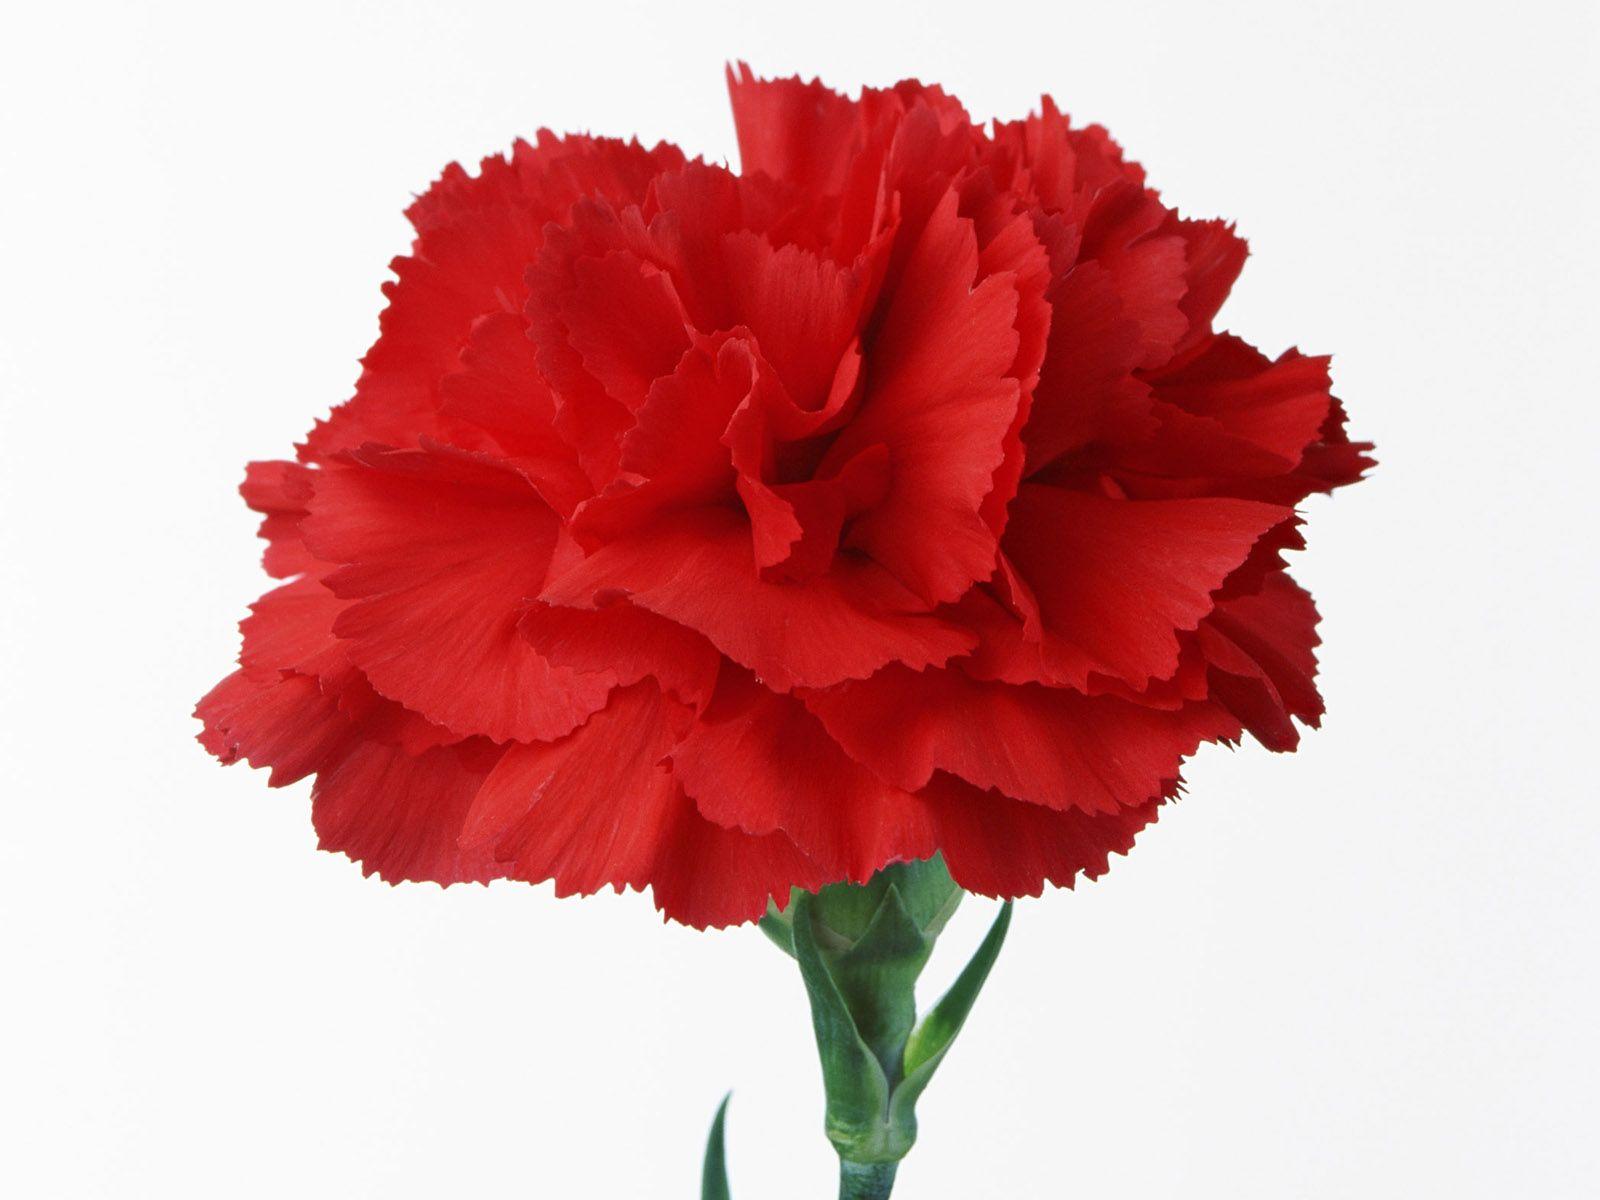 Carnation Red Carnation Carnations Carnation Flower